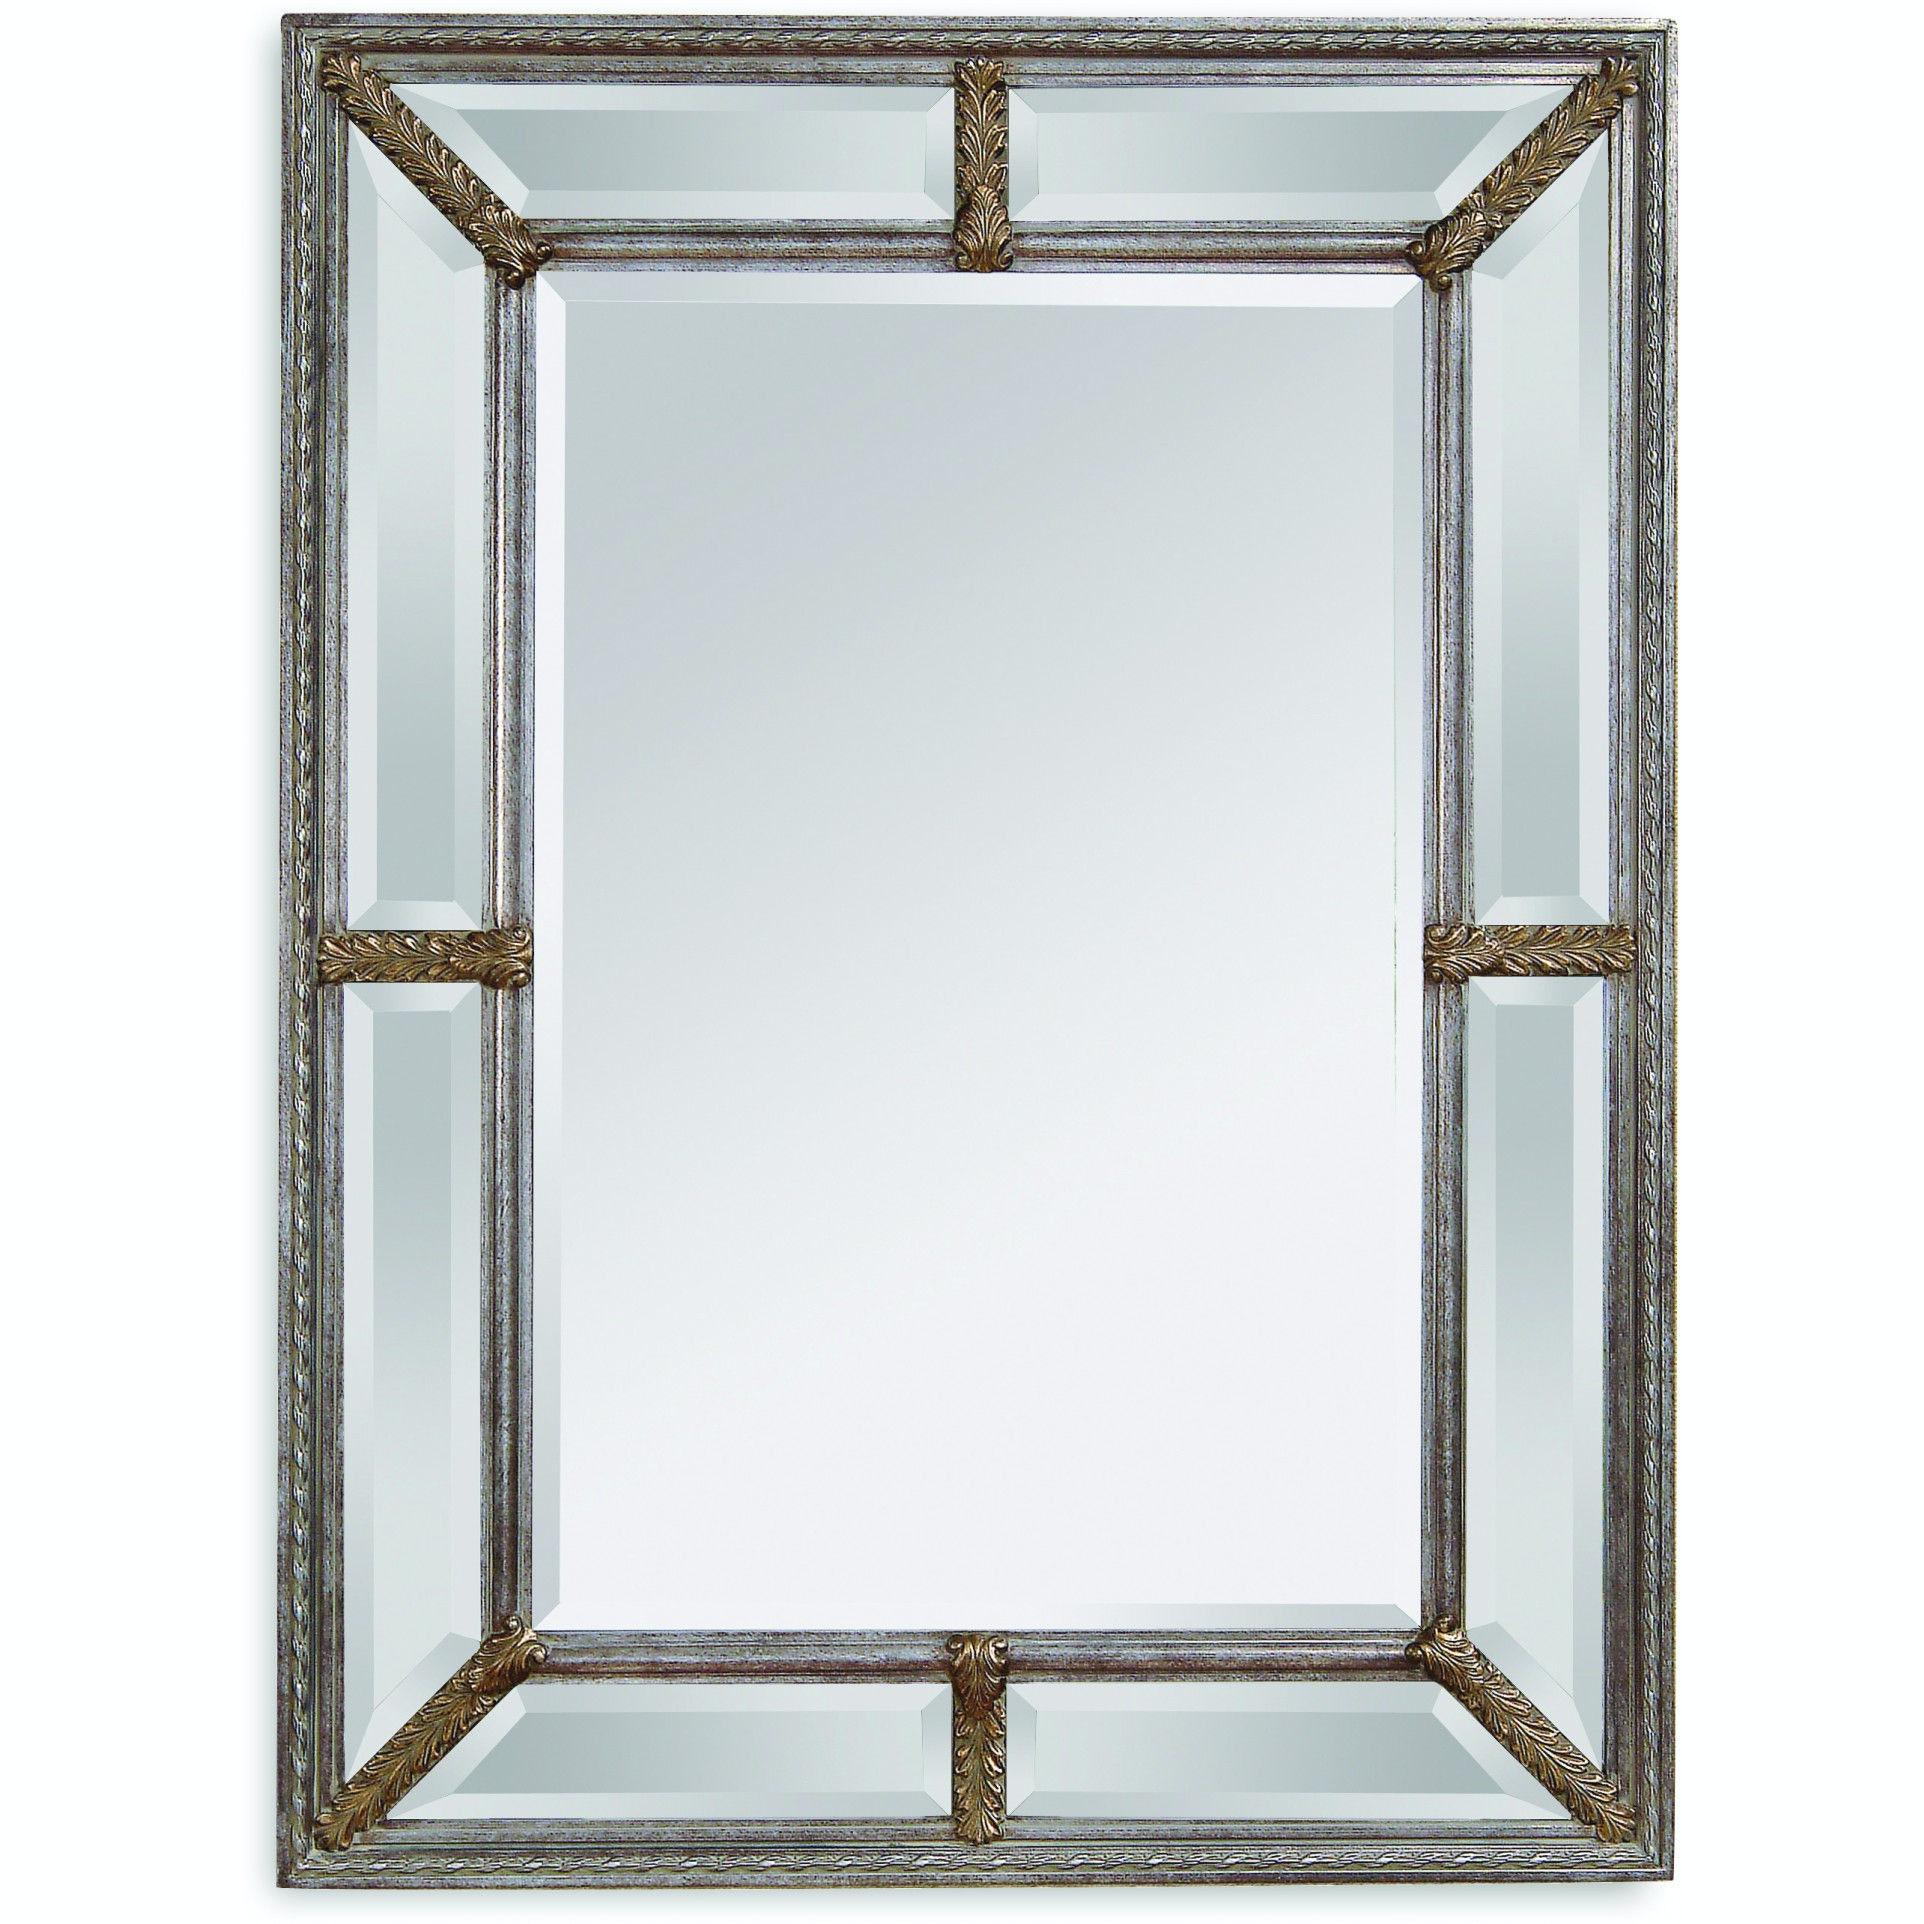 Bassett Mirror pany Accessories Roma Wall Mirror 6357